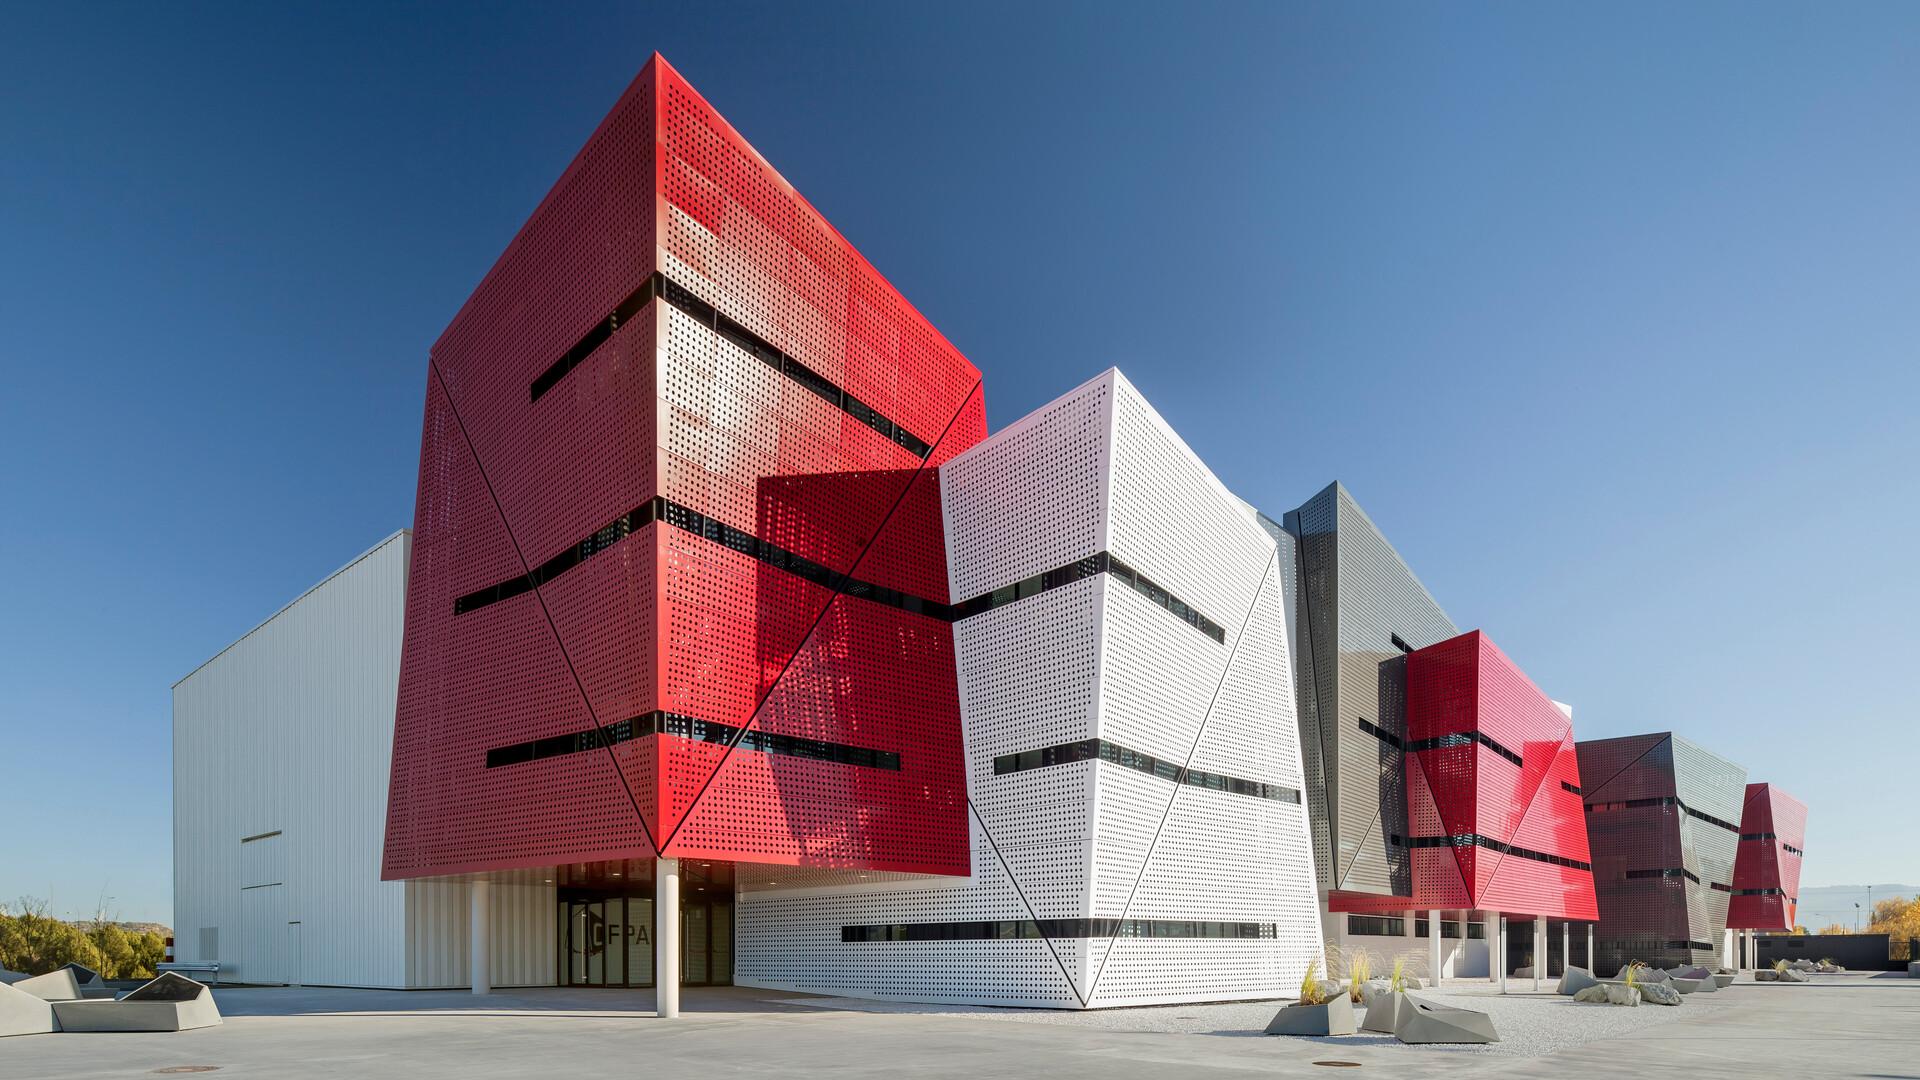 Automotive Vocational Training Centre in Martorell, Martorell, Spain, 5600 m2, 21500 ml Chicago Metallic grid, Marc Casany Estrada (CAAS Architects), TECAFRIC, Adrià Goula, ROCKFON Color-all, A24-edge, 600 x 600 x 20, Stone, T24 system 2850 color 54